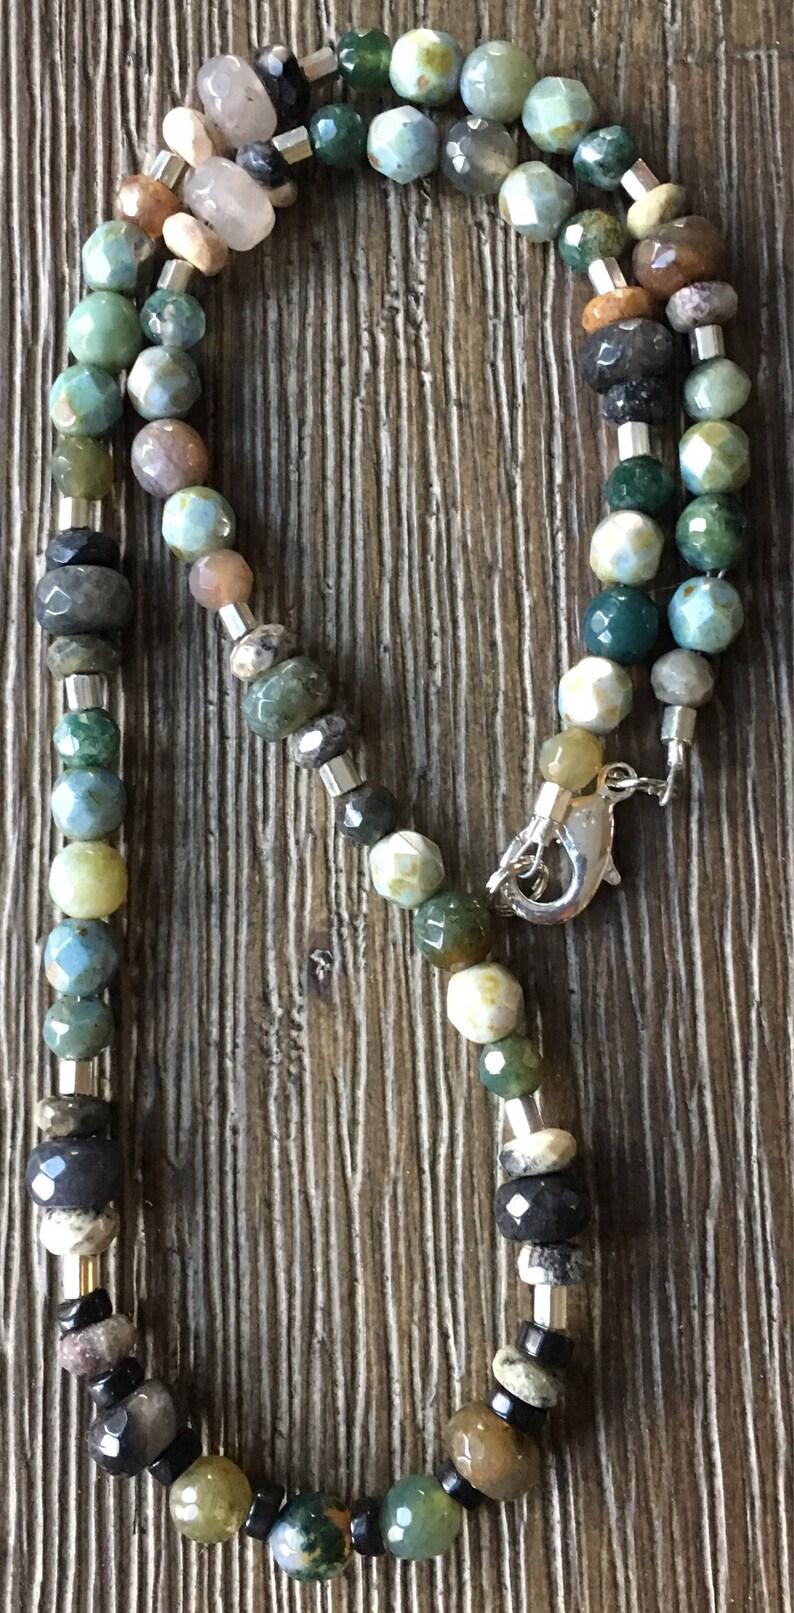 Rainbow Agate necklace Jasper necklace Czech Glass necklace Jade necklace